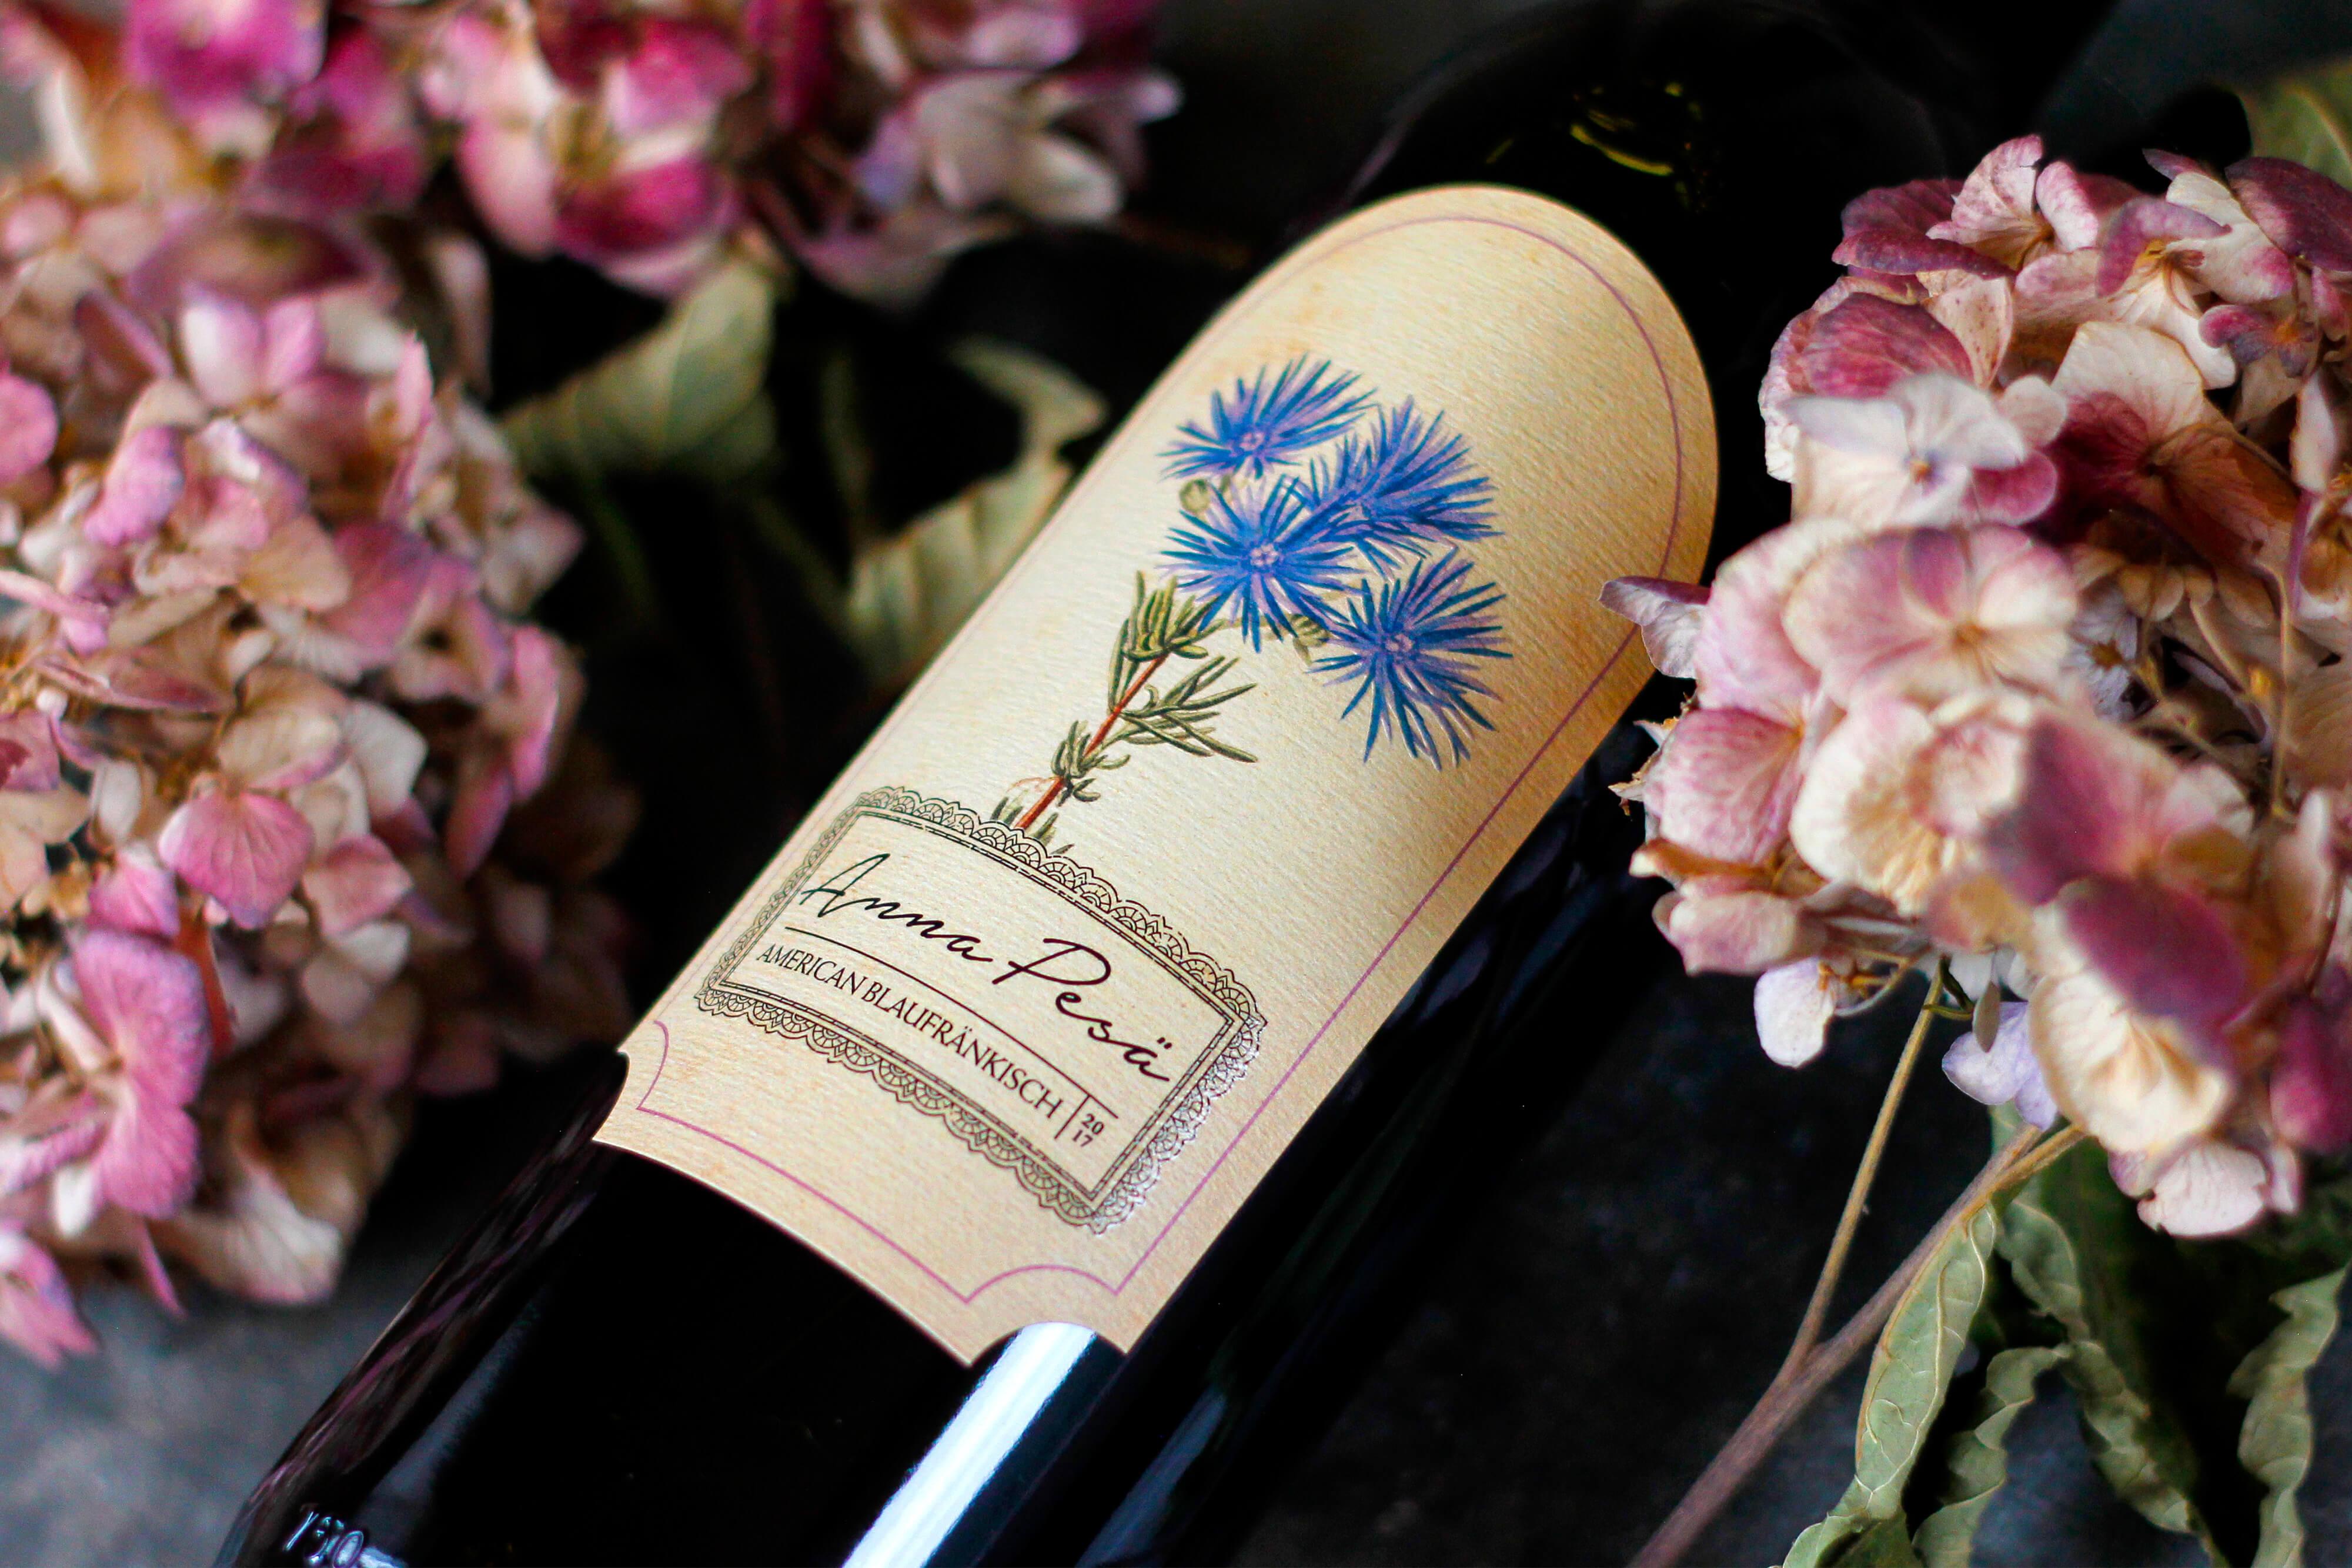 Anna Pesä Blaufränkisch 2017 is an award winning dry red wine with a light body notes of dark berries and cedar.